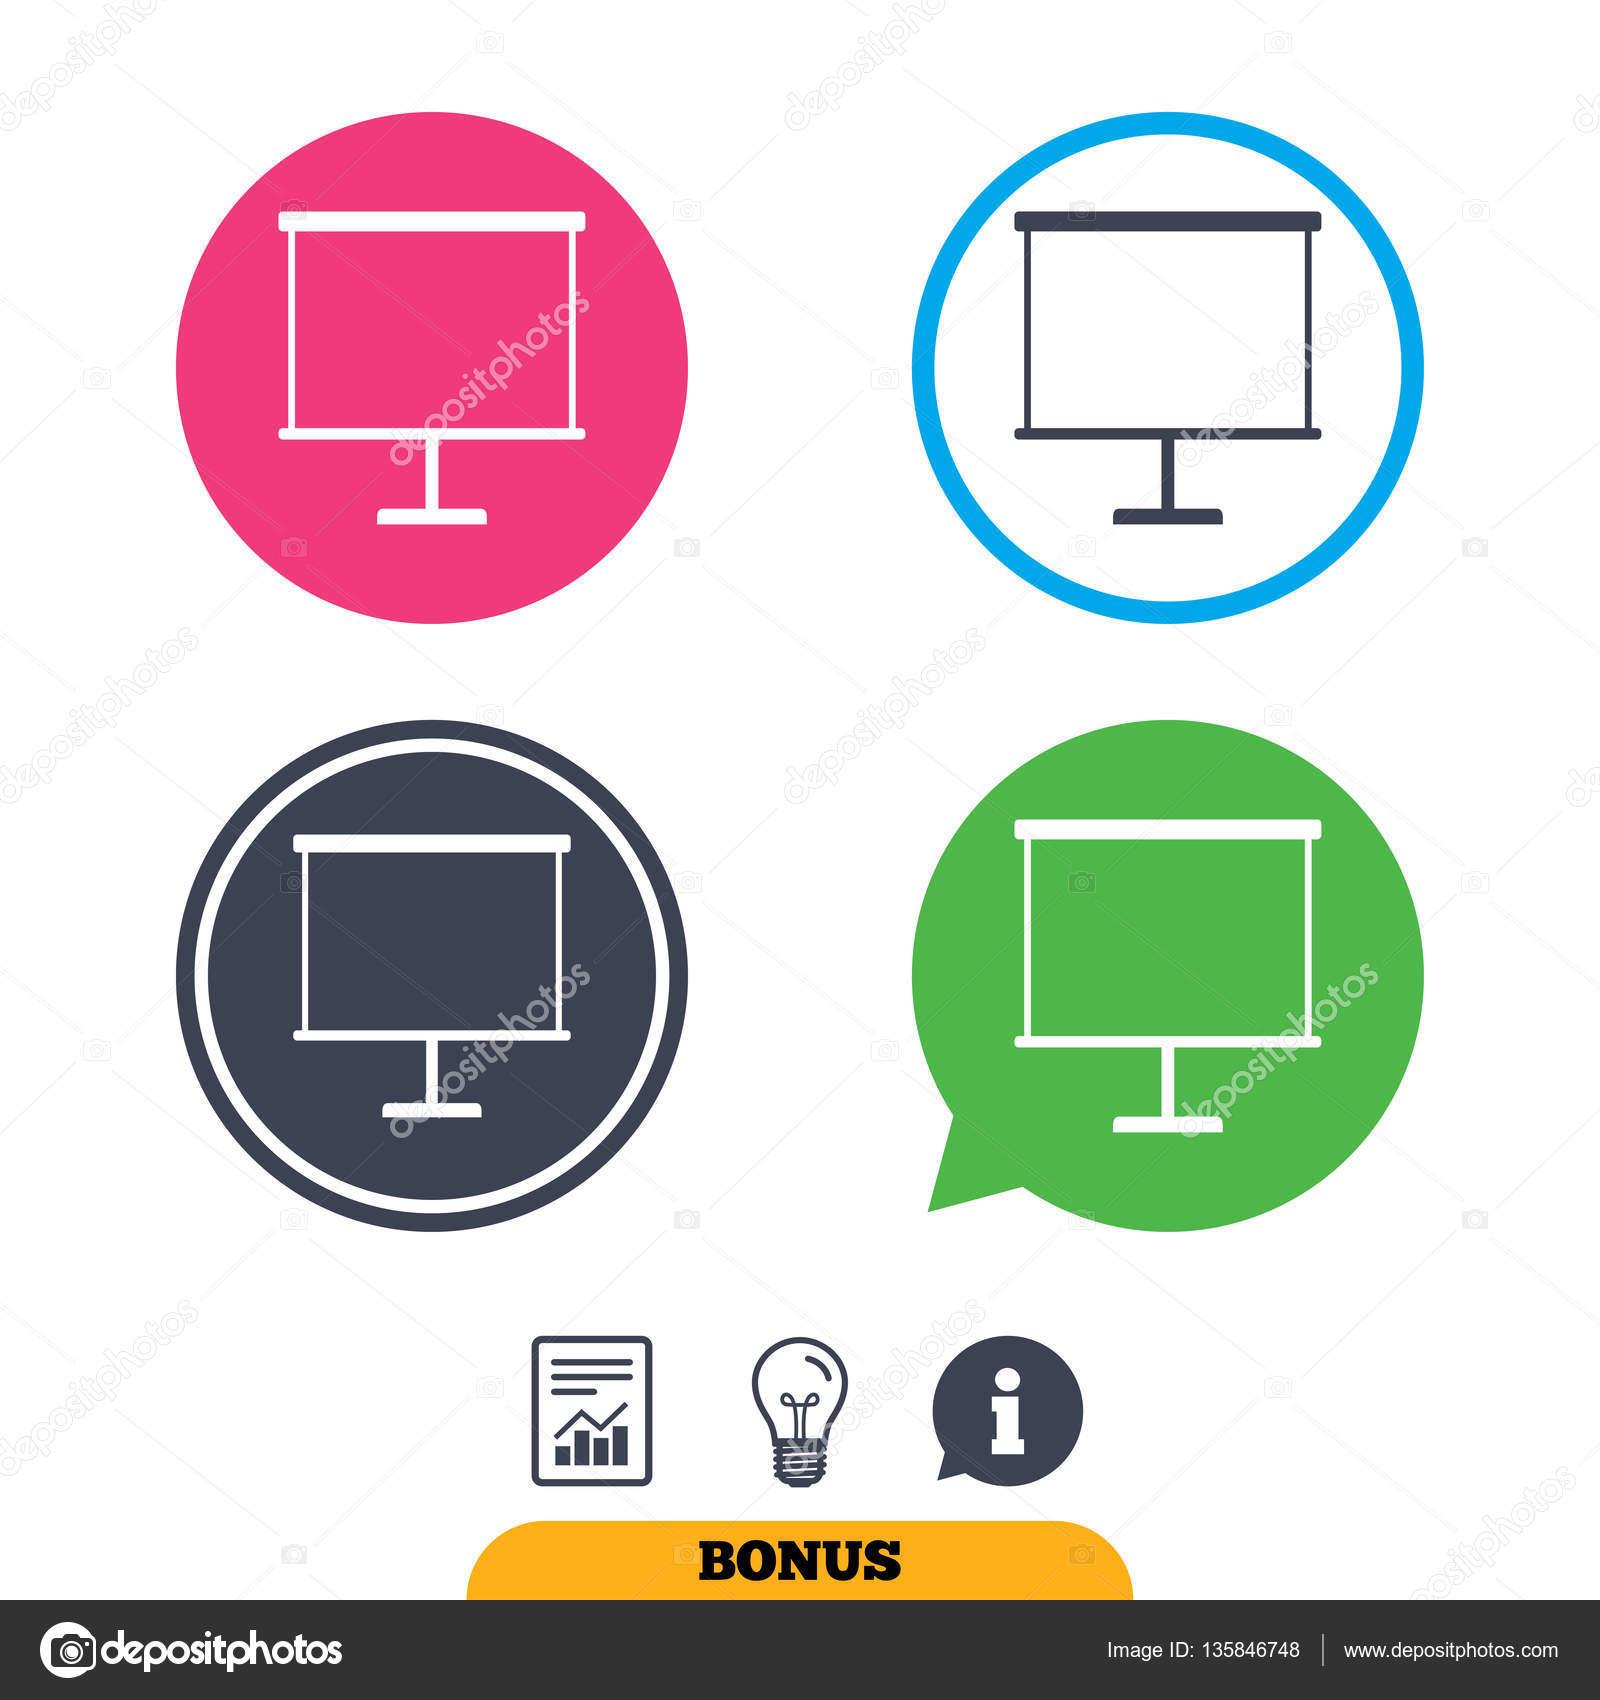 presentation billboard sign icon ppt symbol stock vector